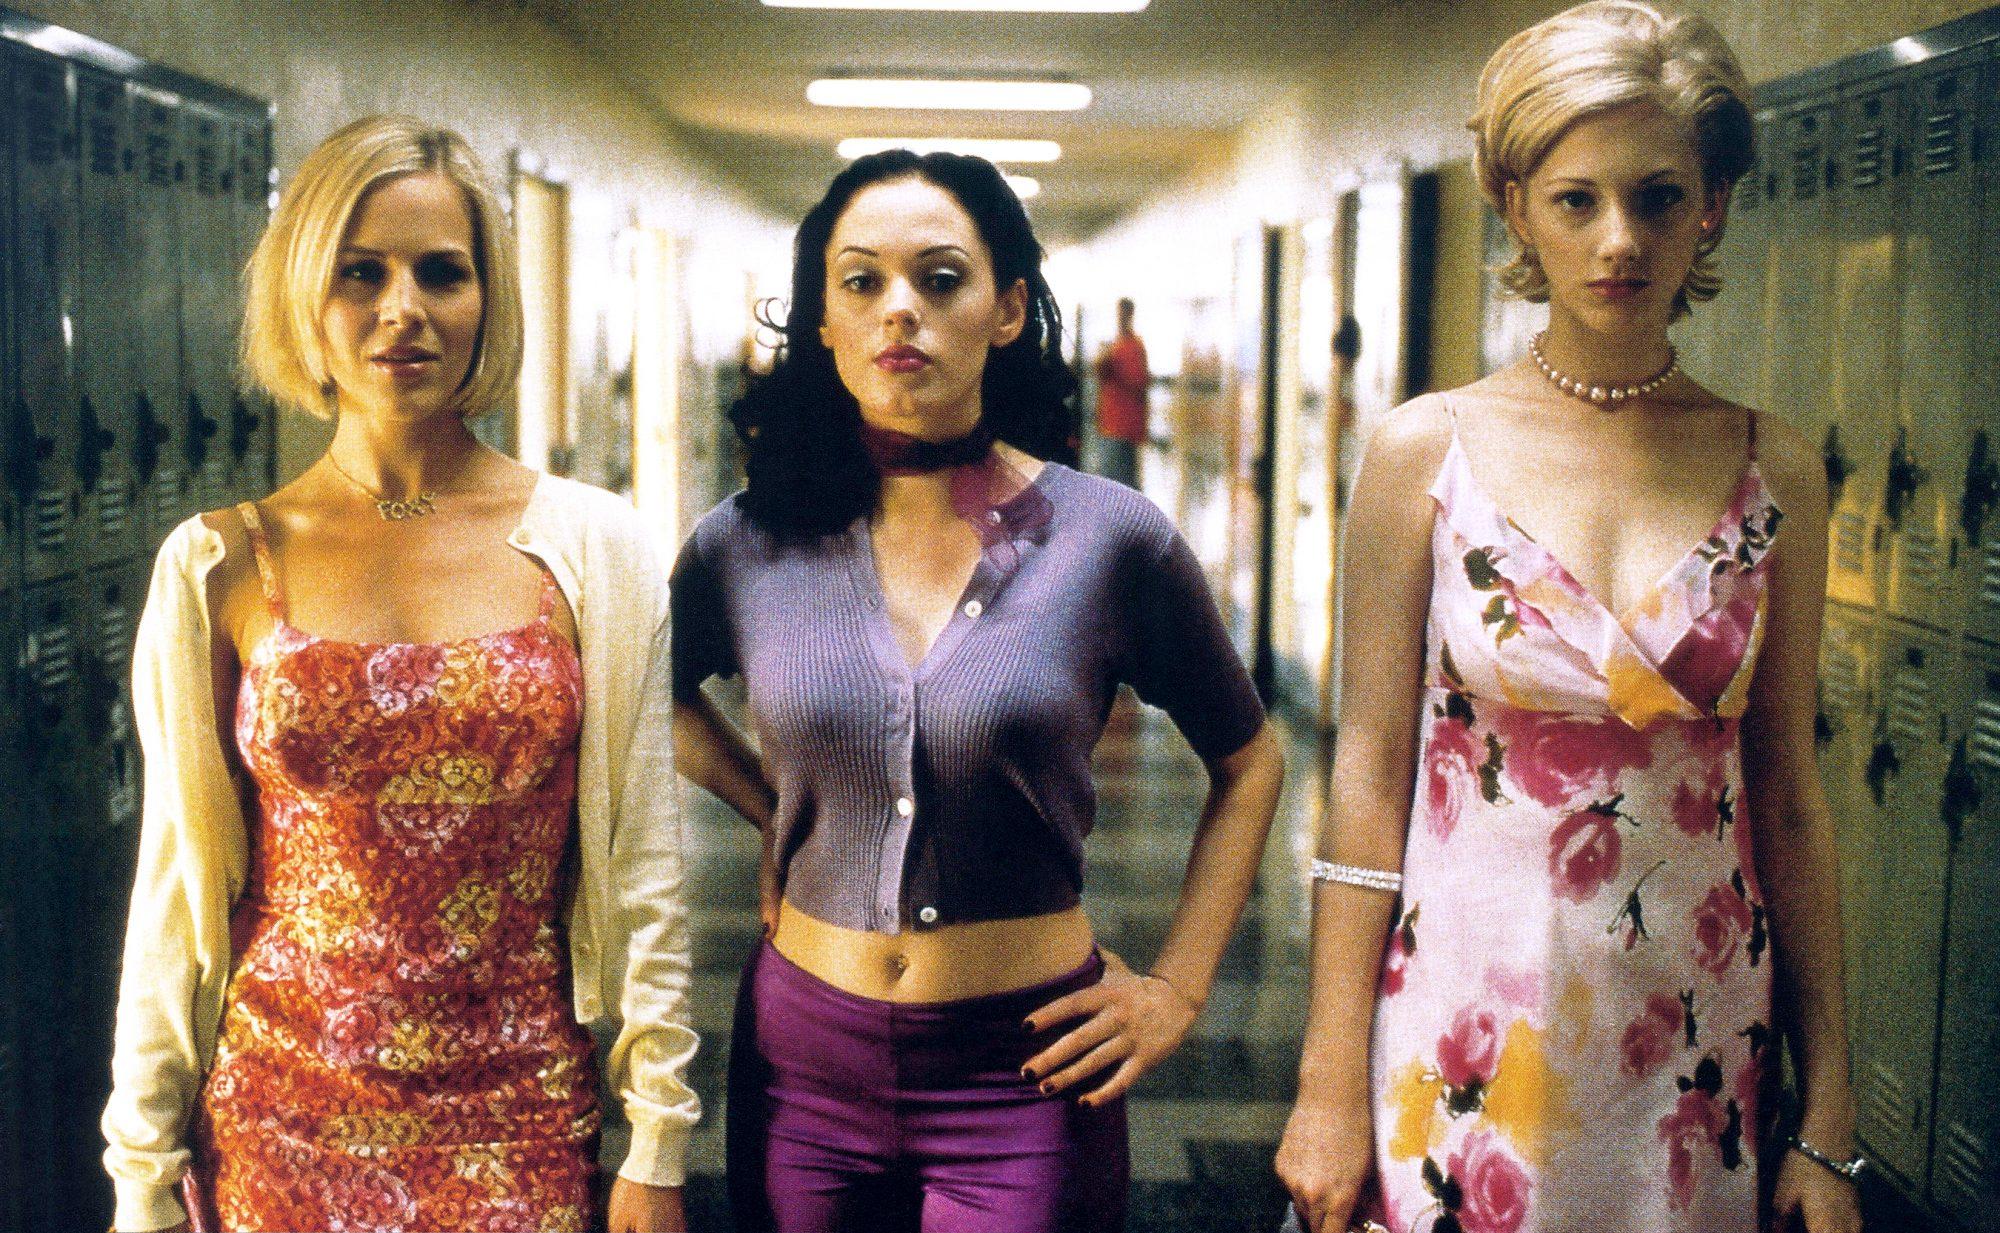 JAWBREAKER, from left: Julie Benz, Rose McGowan, Judy Greer, 1999, © TriStar/courtesy Everett